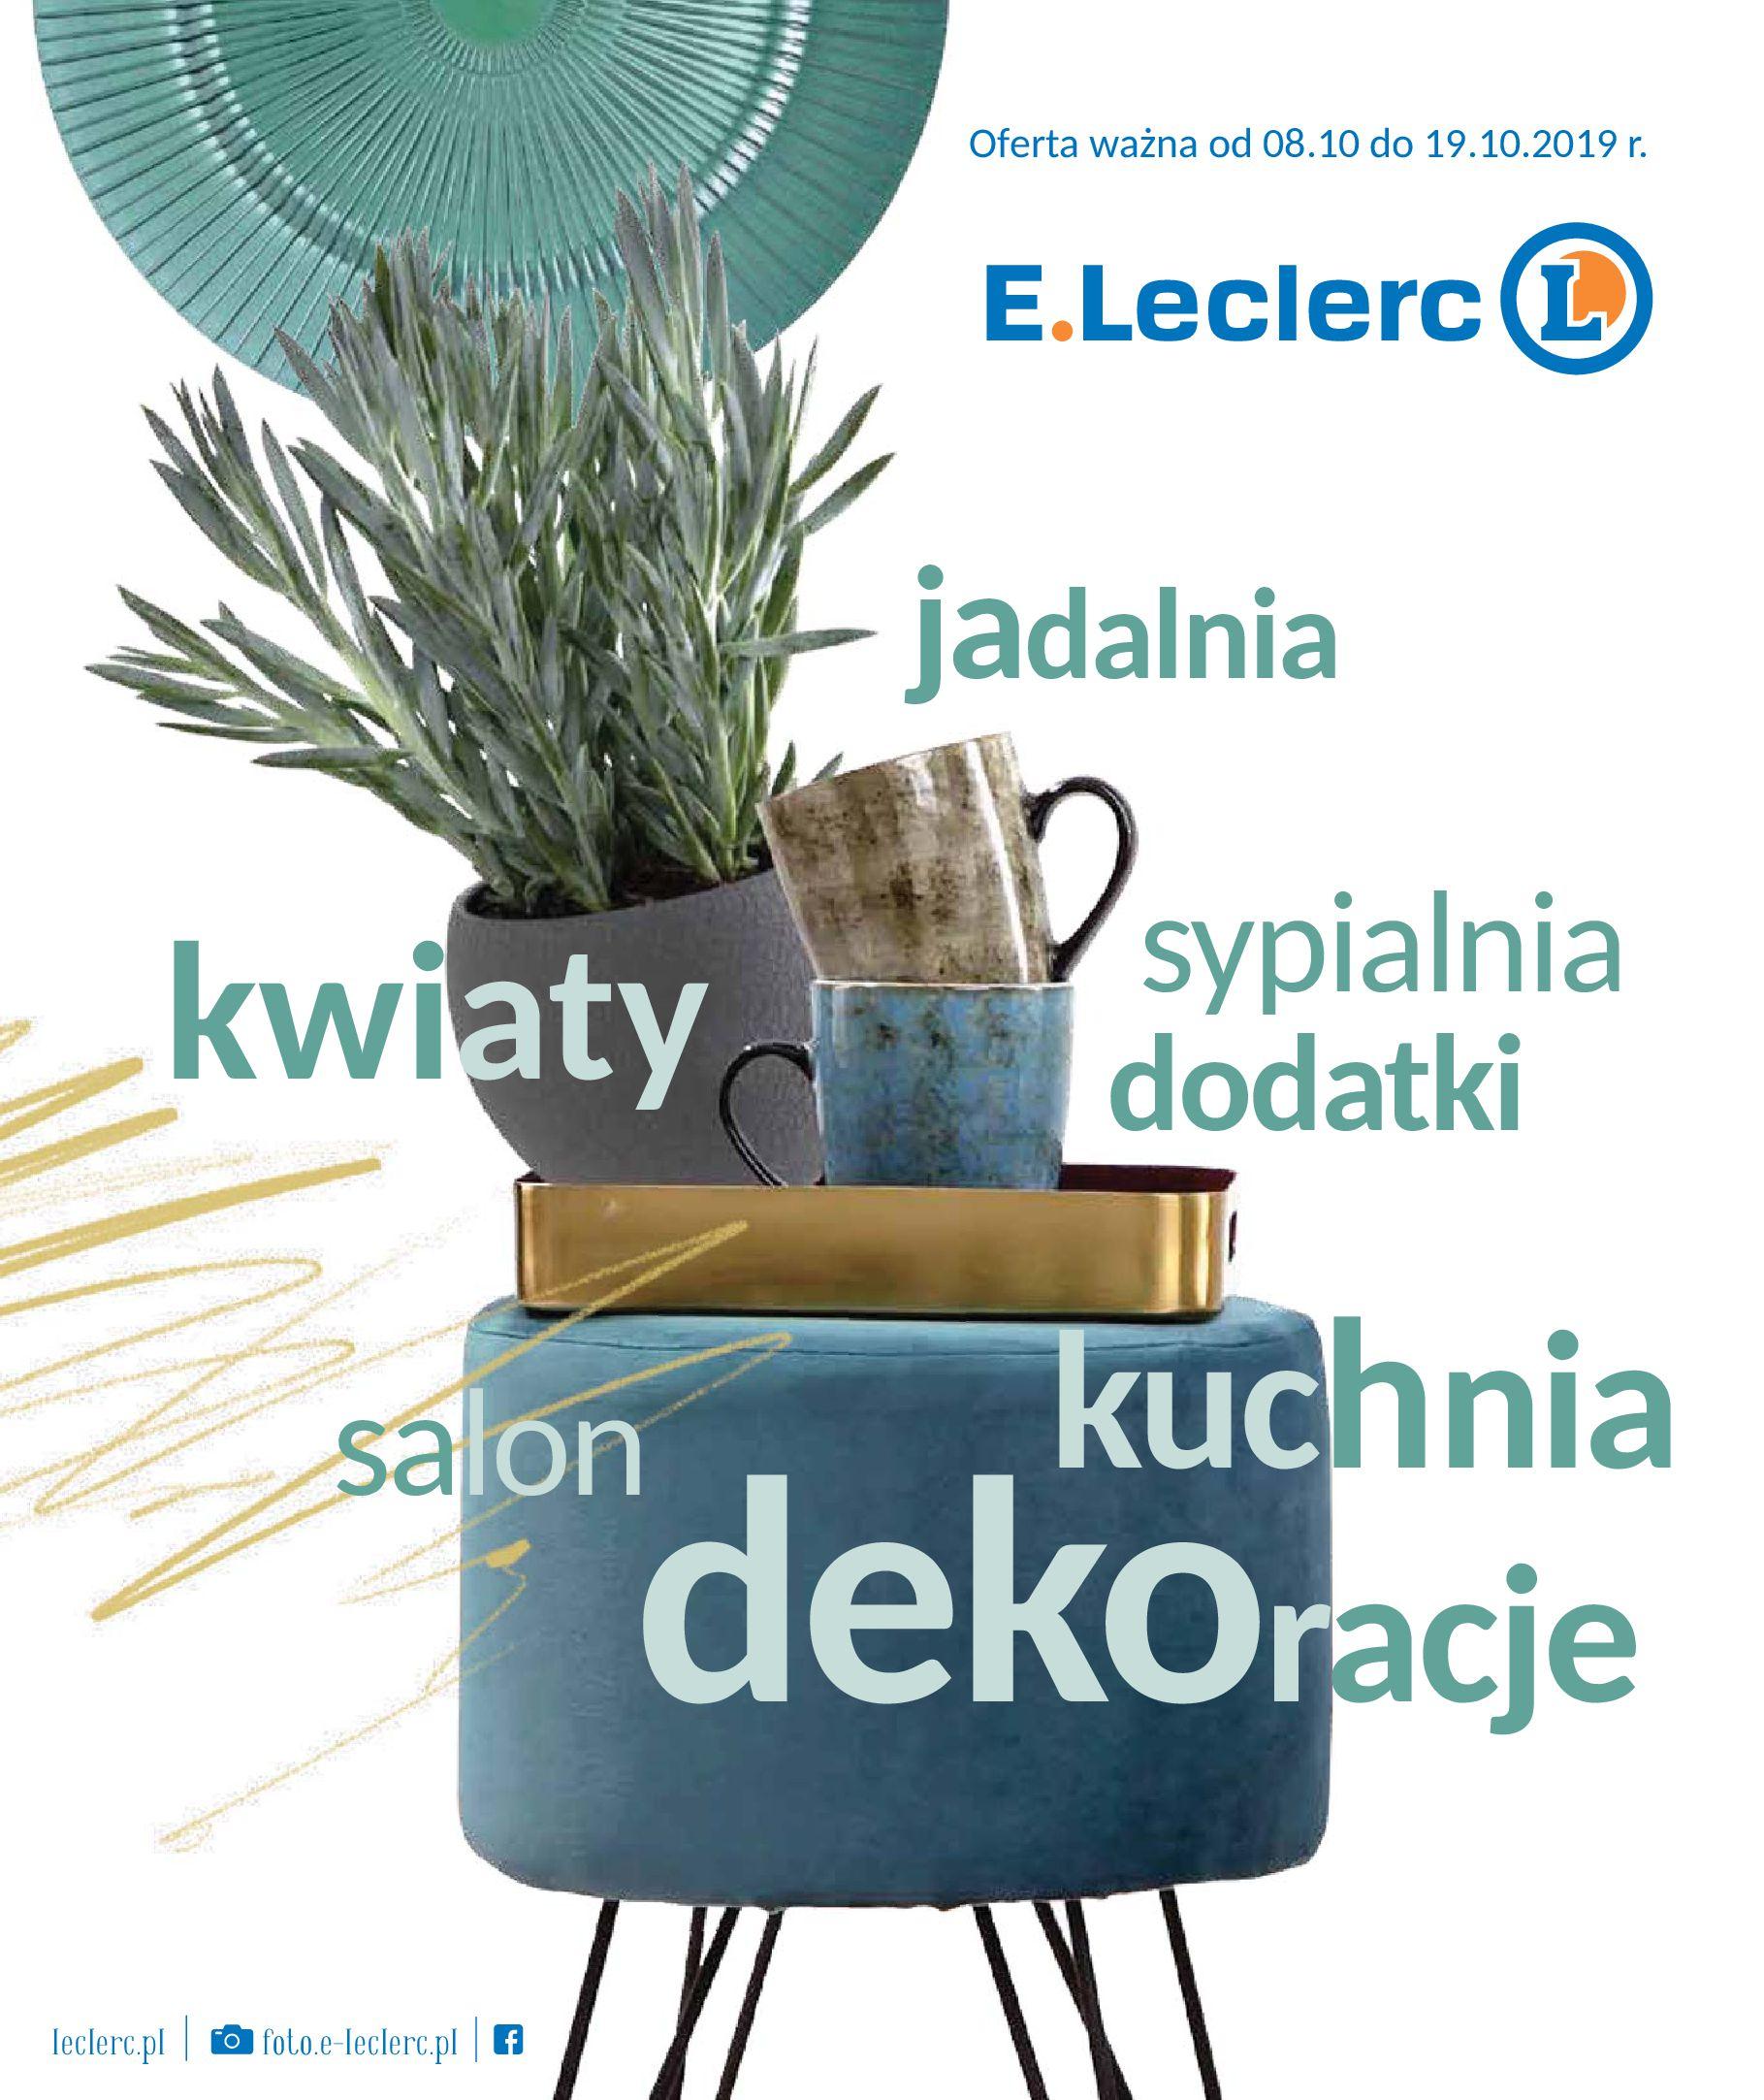 Gazetka E.Leclerc - Oferta promocyjna-07.10.2019-19.10.2019-page-1